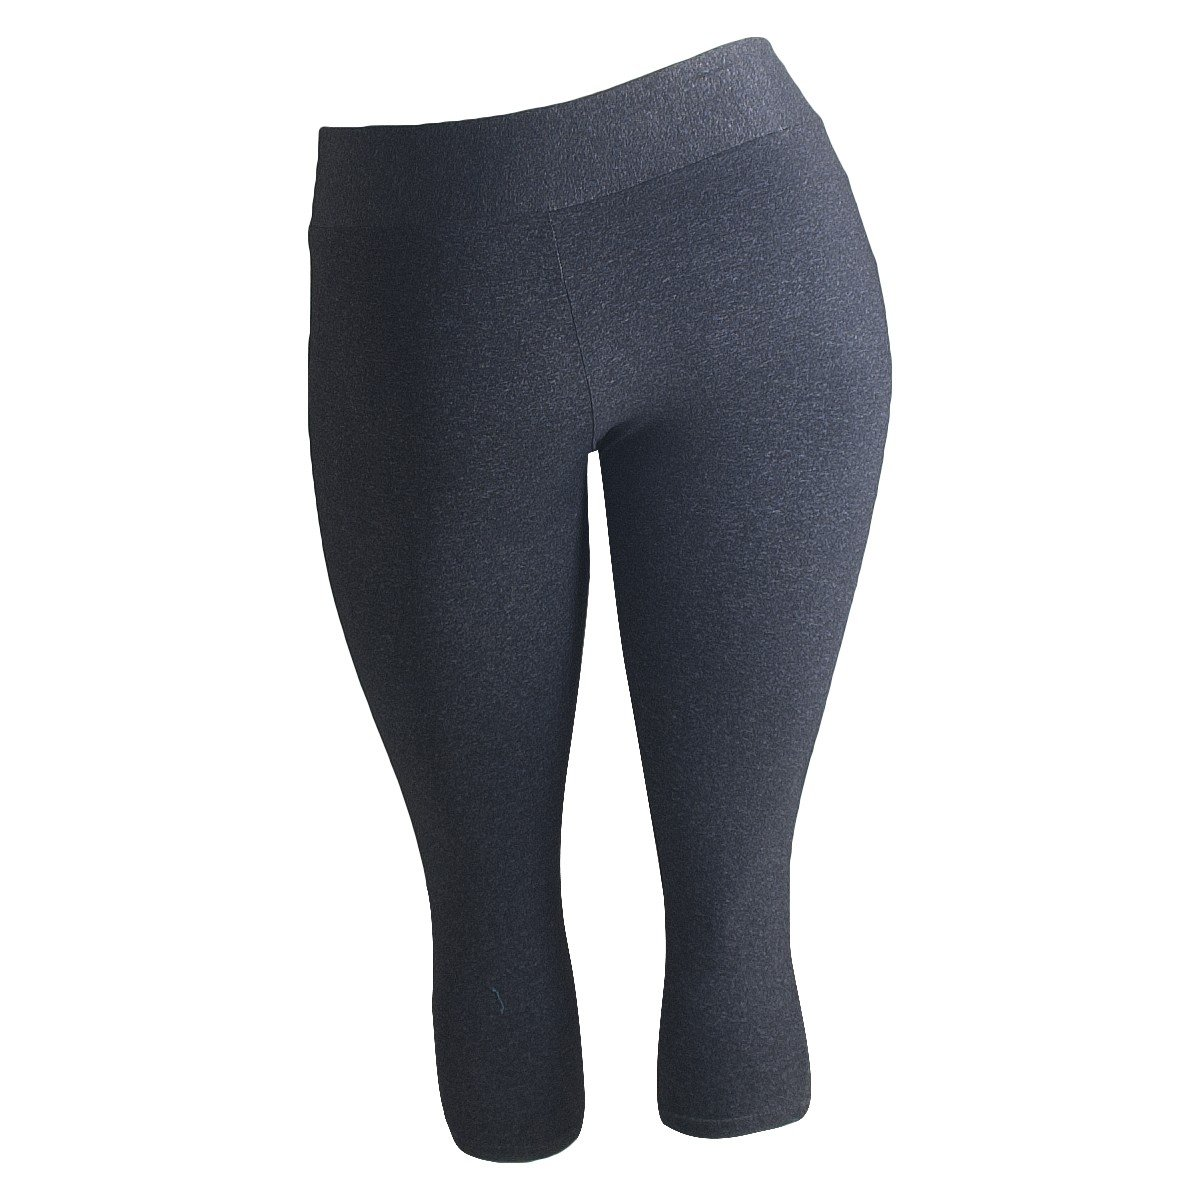 Corsário Chumbo Calça Plus Calça Feminina Size Fit Way Plus Size q6wXz6